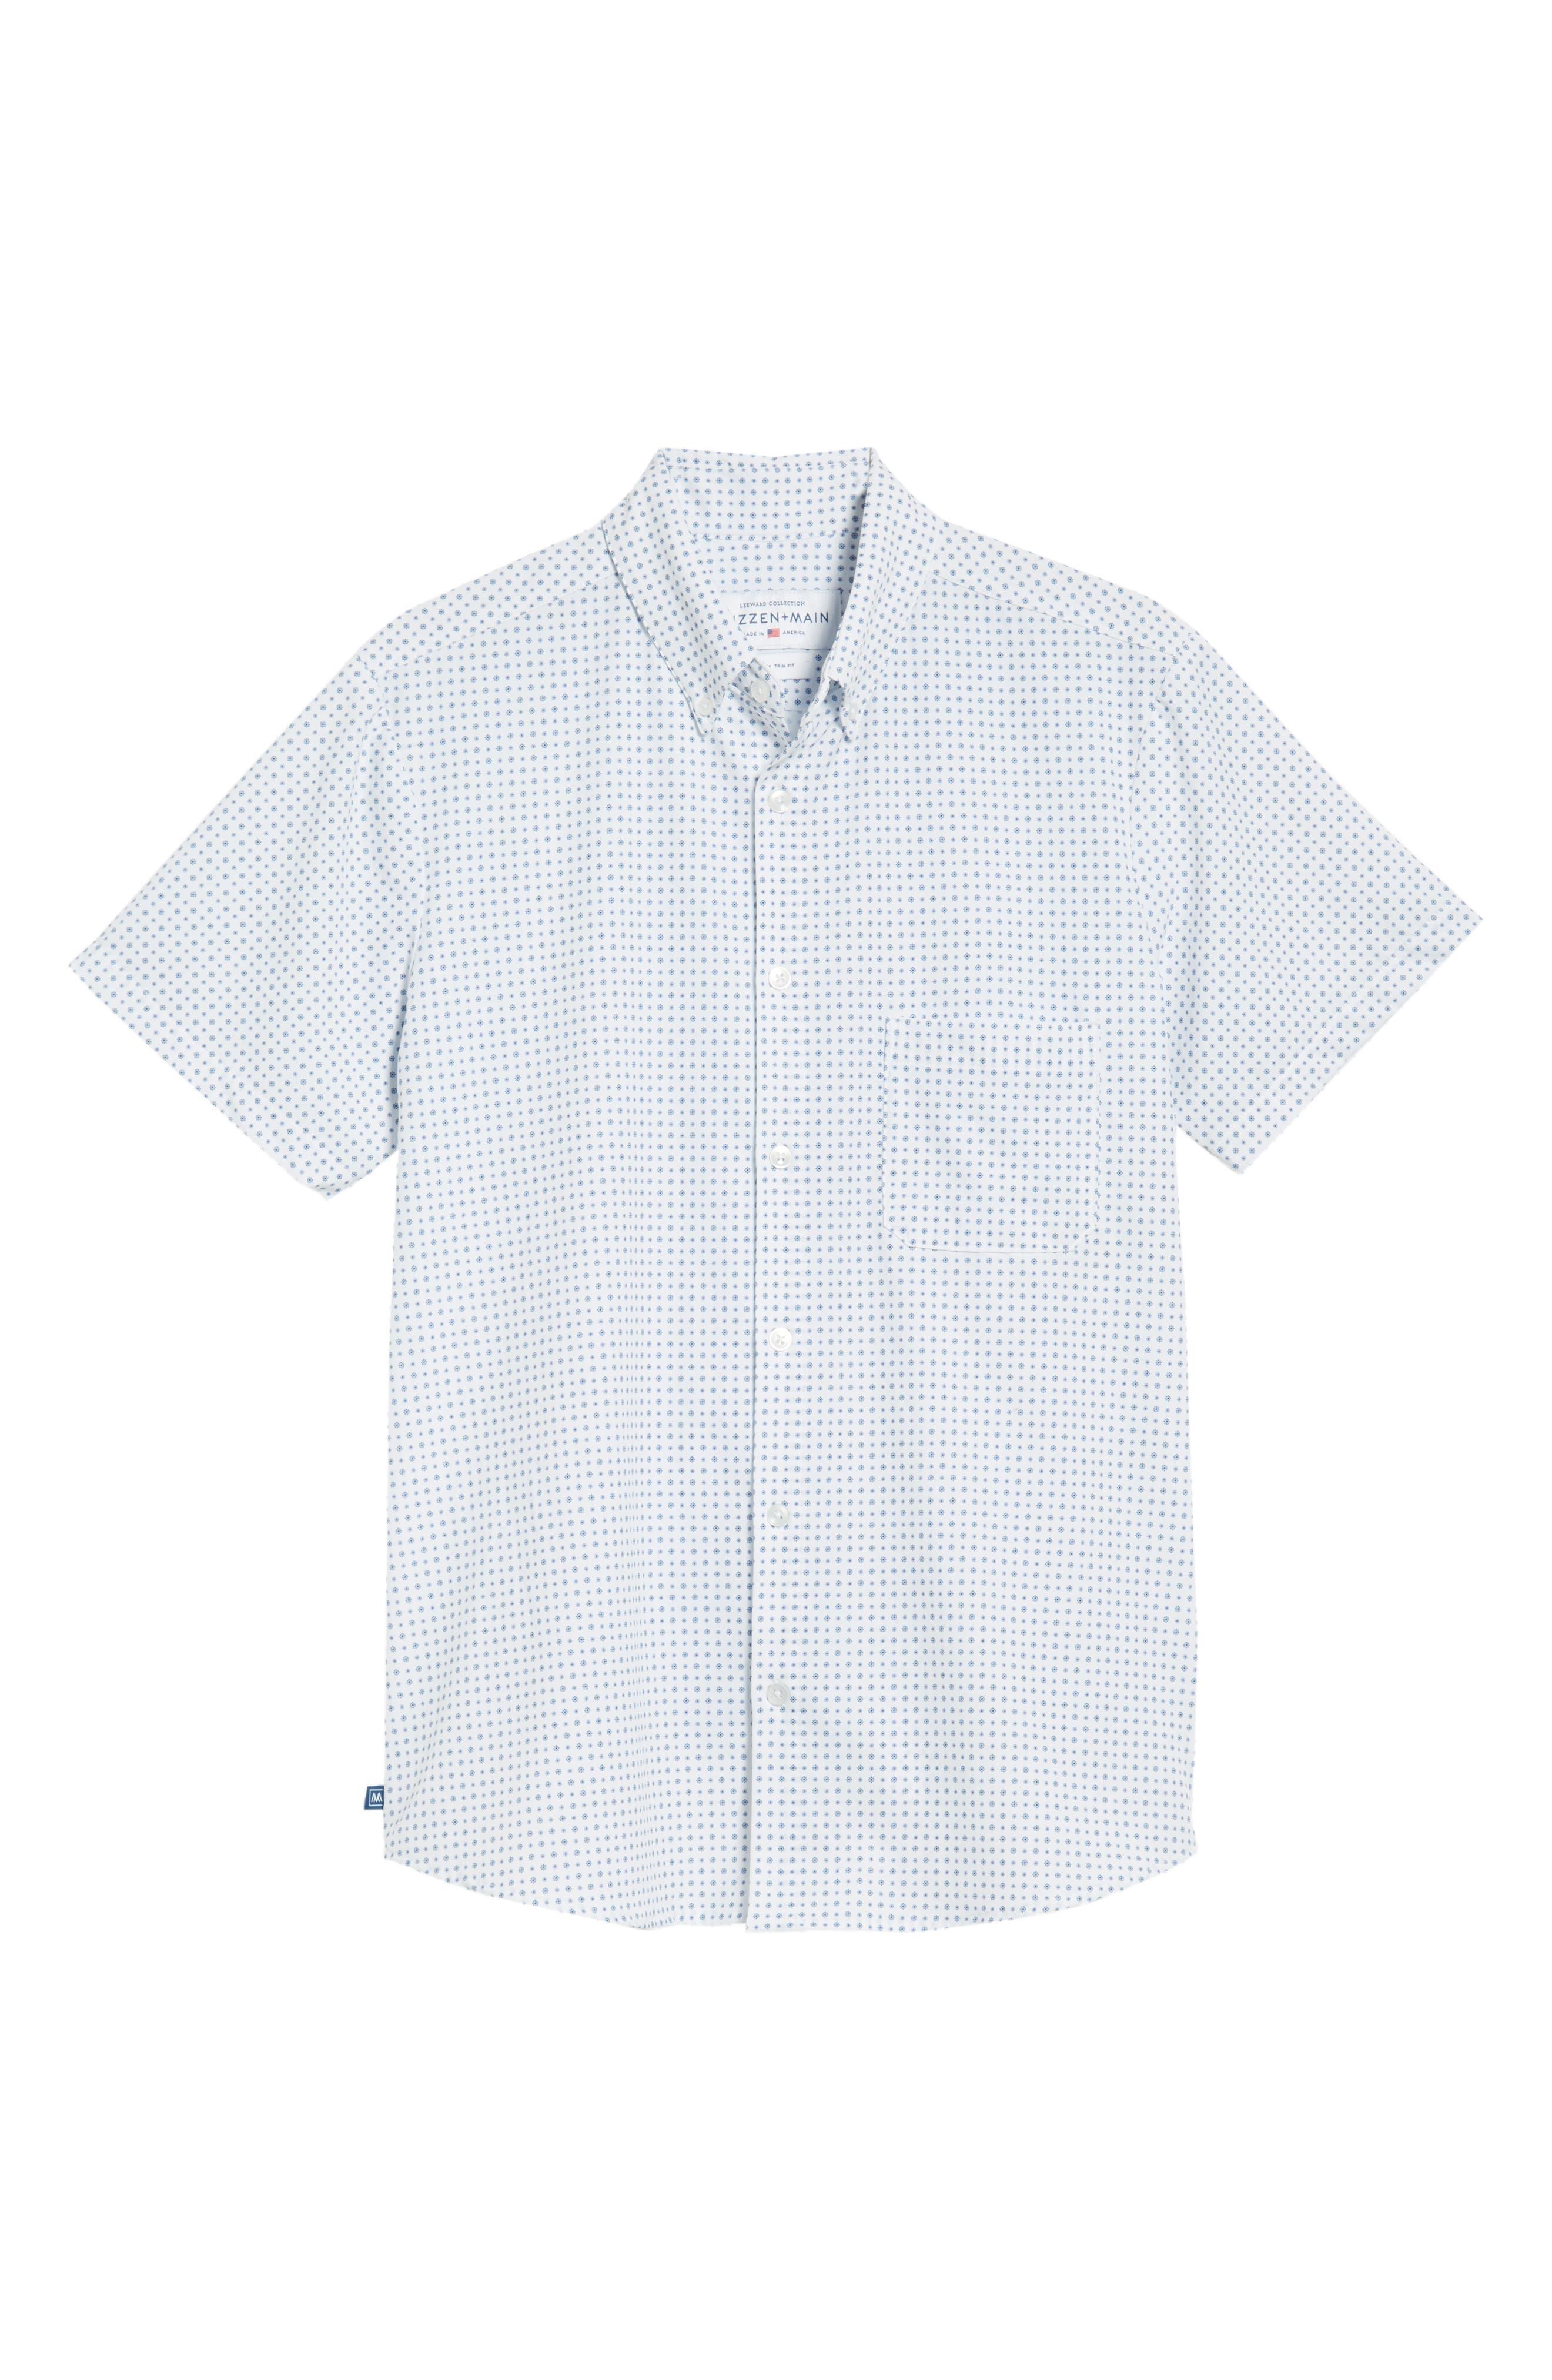 Darst Slim Fit Performance Sport Shirt,                             Alternate thumbnail 6, color,                             117